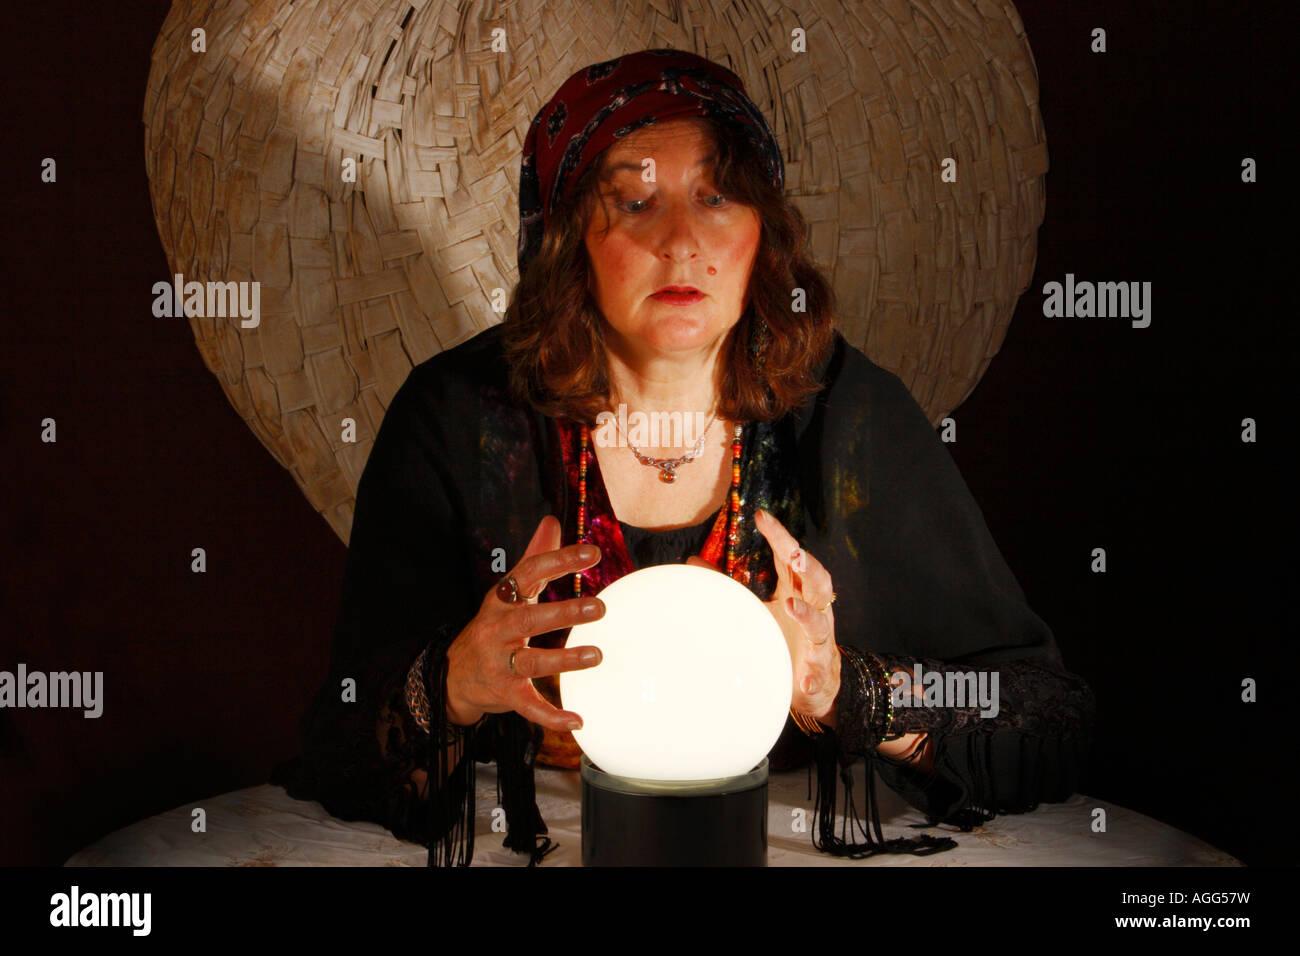 Woman Fortune Teller - Stock Image